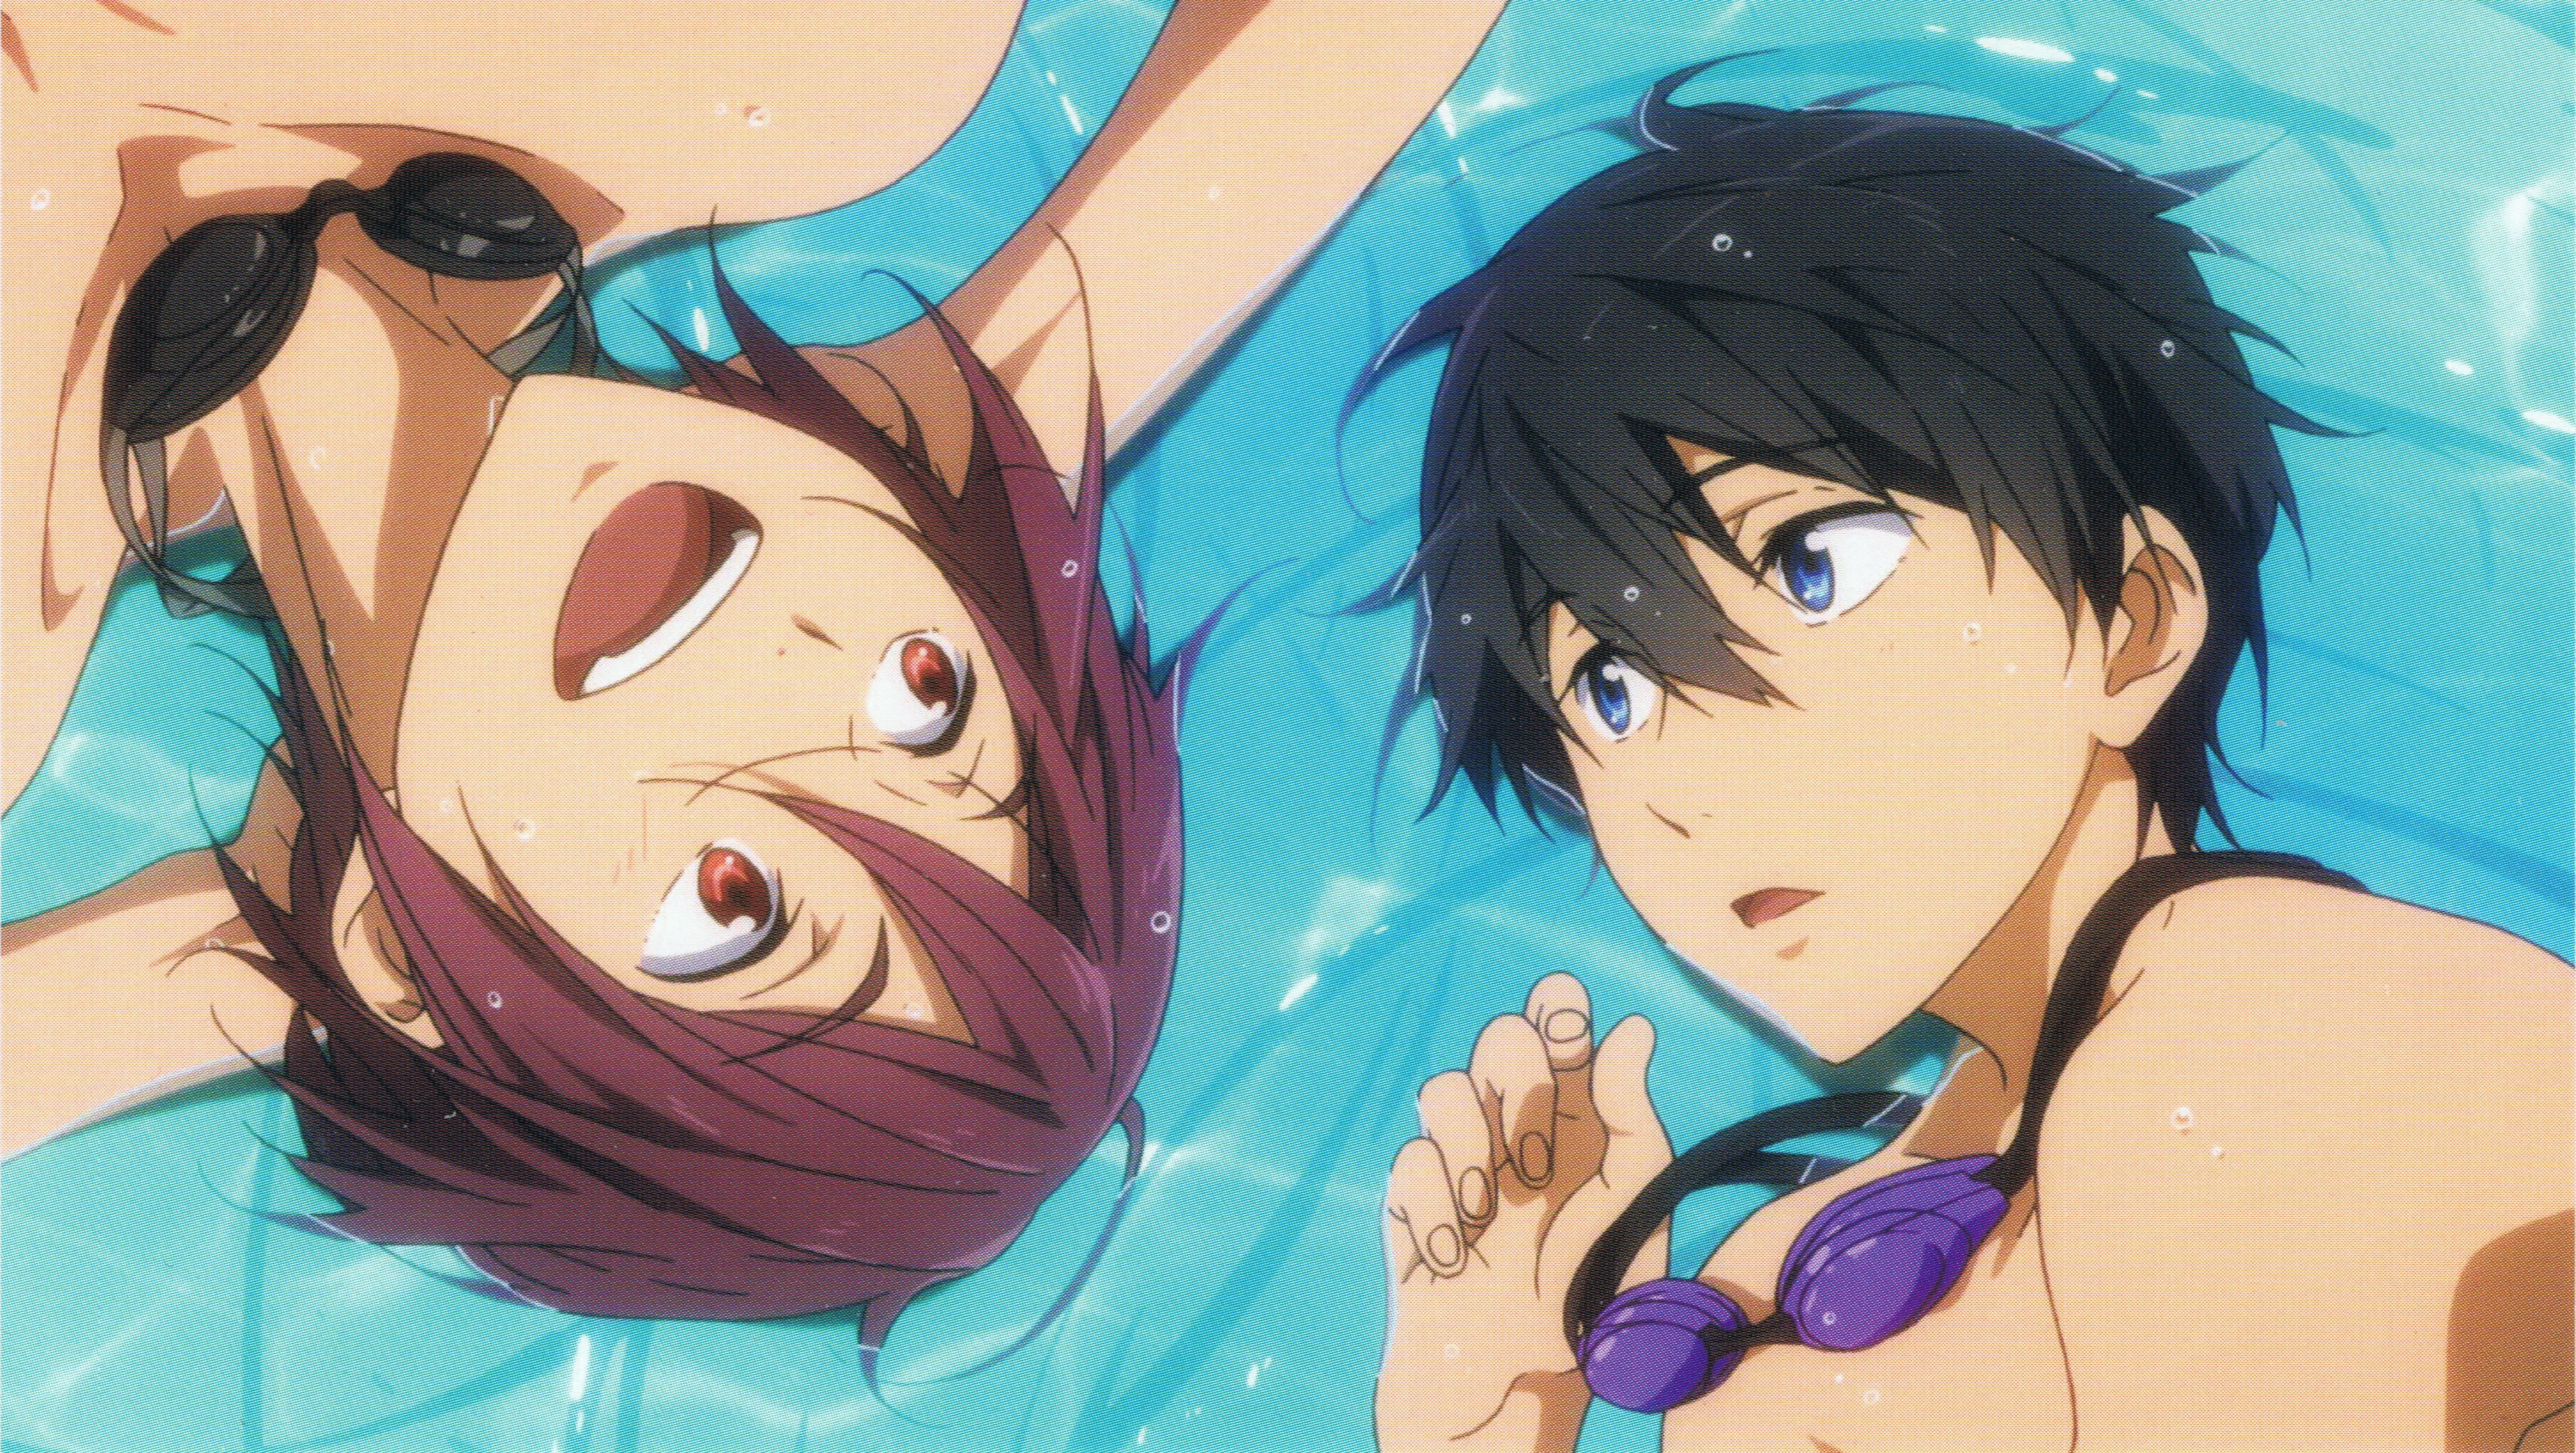 Rinharu Free Zerochan Anime Image Board 'in the name of love' male cover (nightcore version ) link to song nanase haruka vs matsuoka rin but in different pools | free!: zerochan